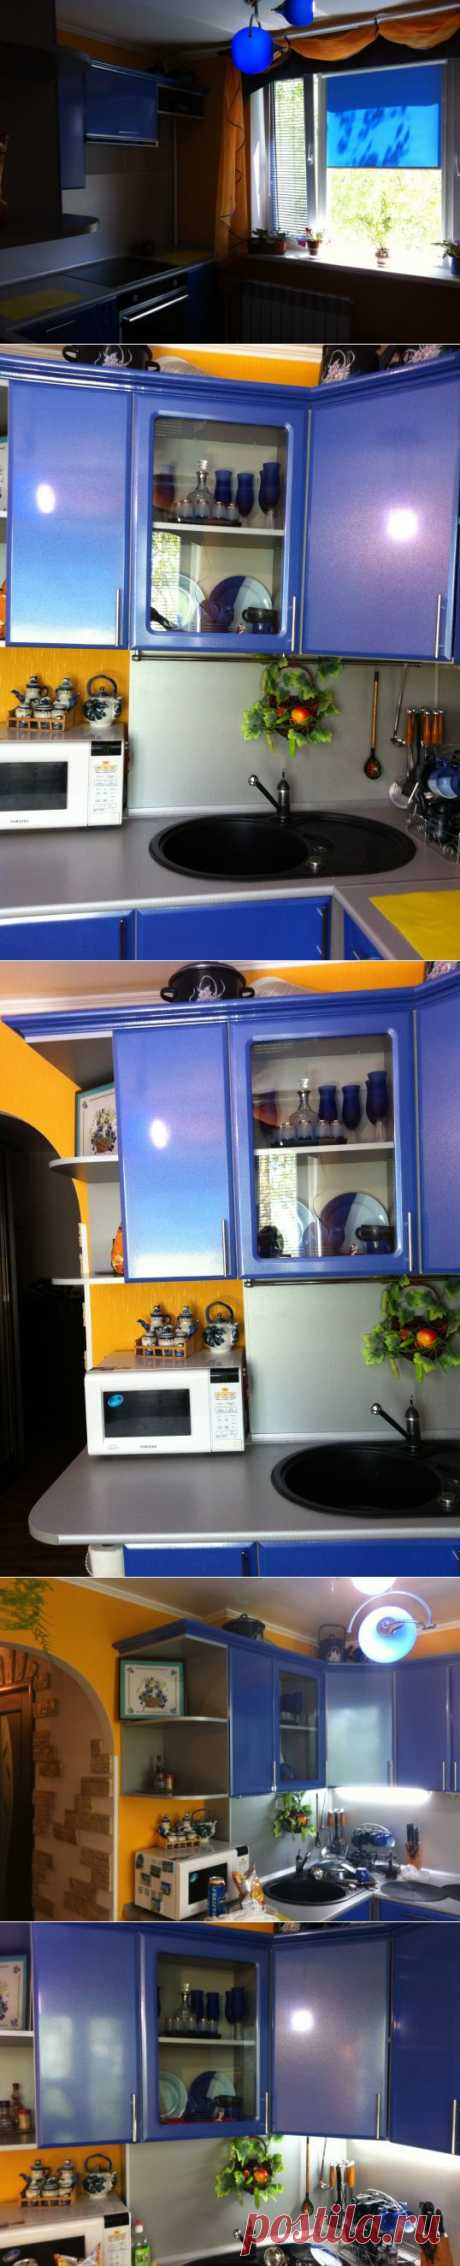 (+1) тема - Кухня.Закончен ремонт. | Школа Ремонта